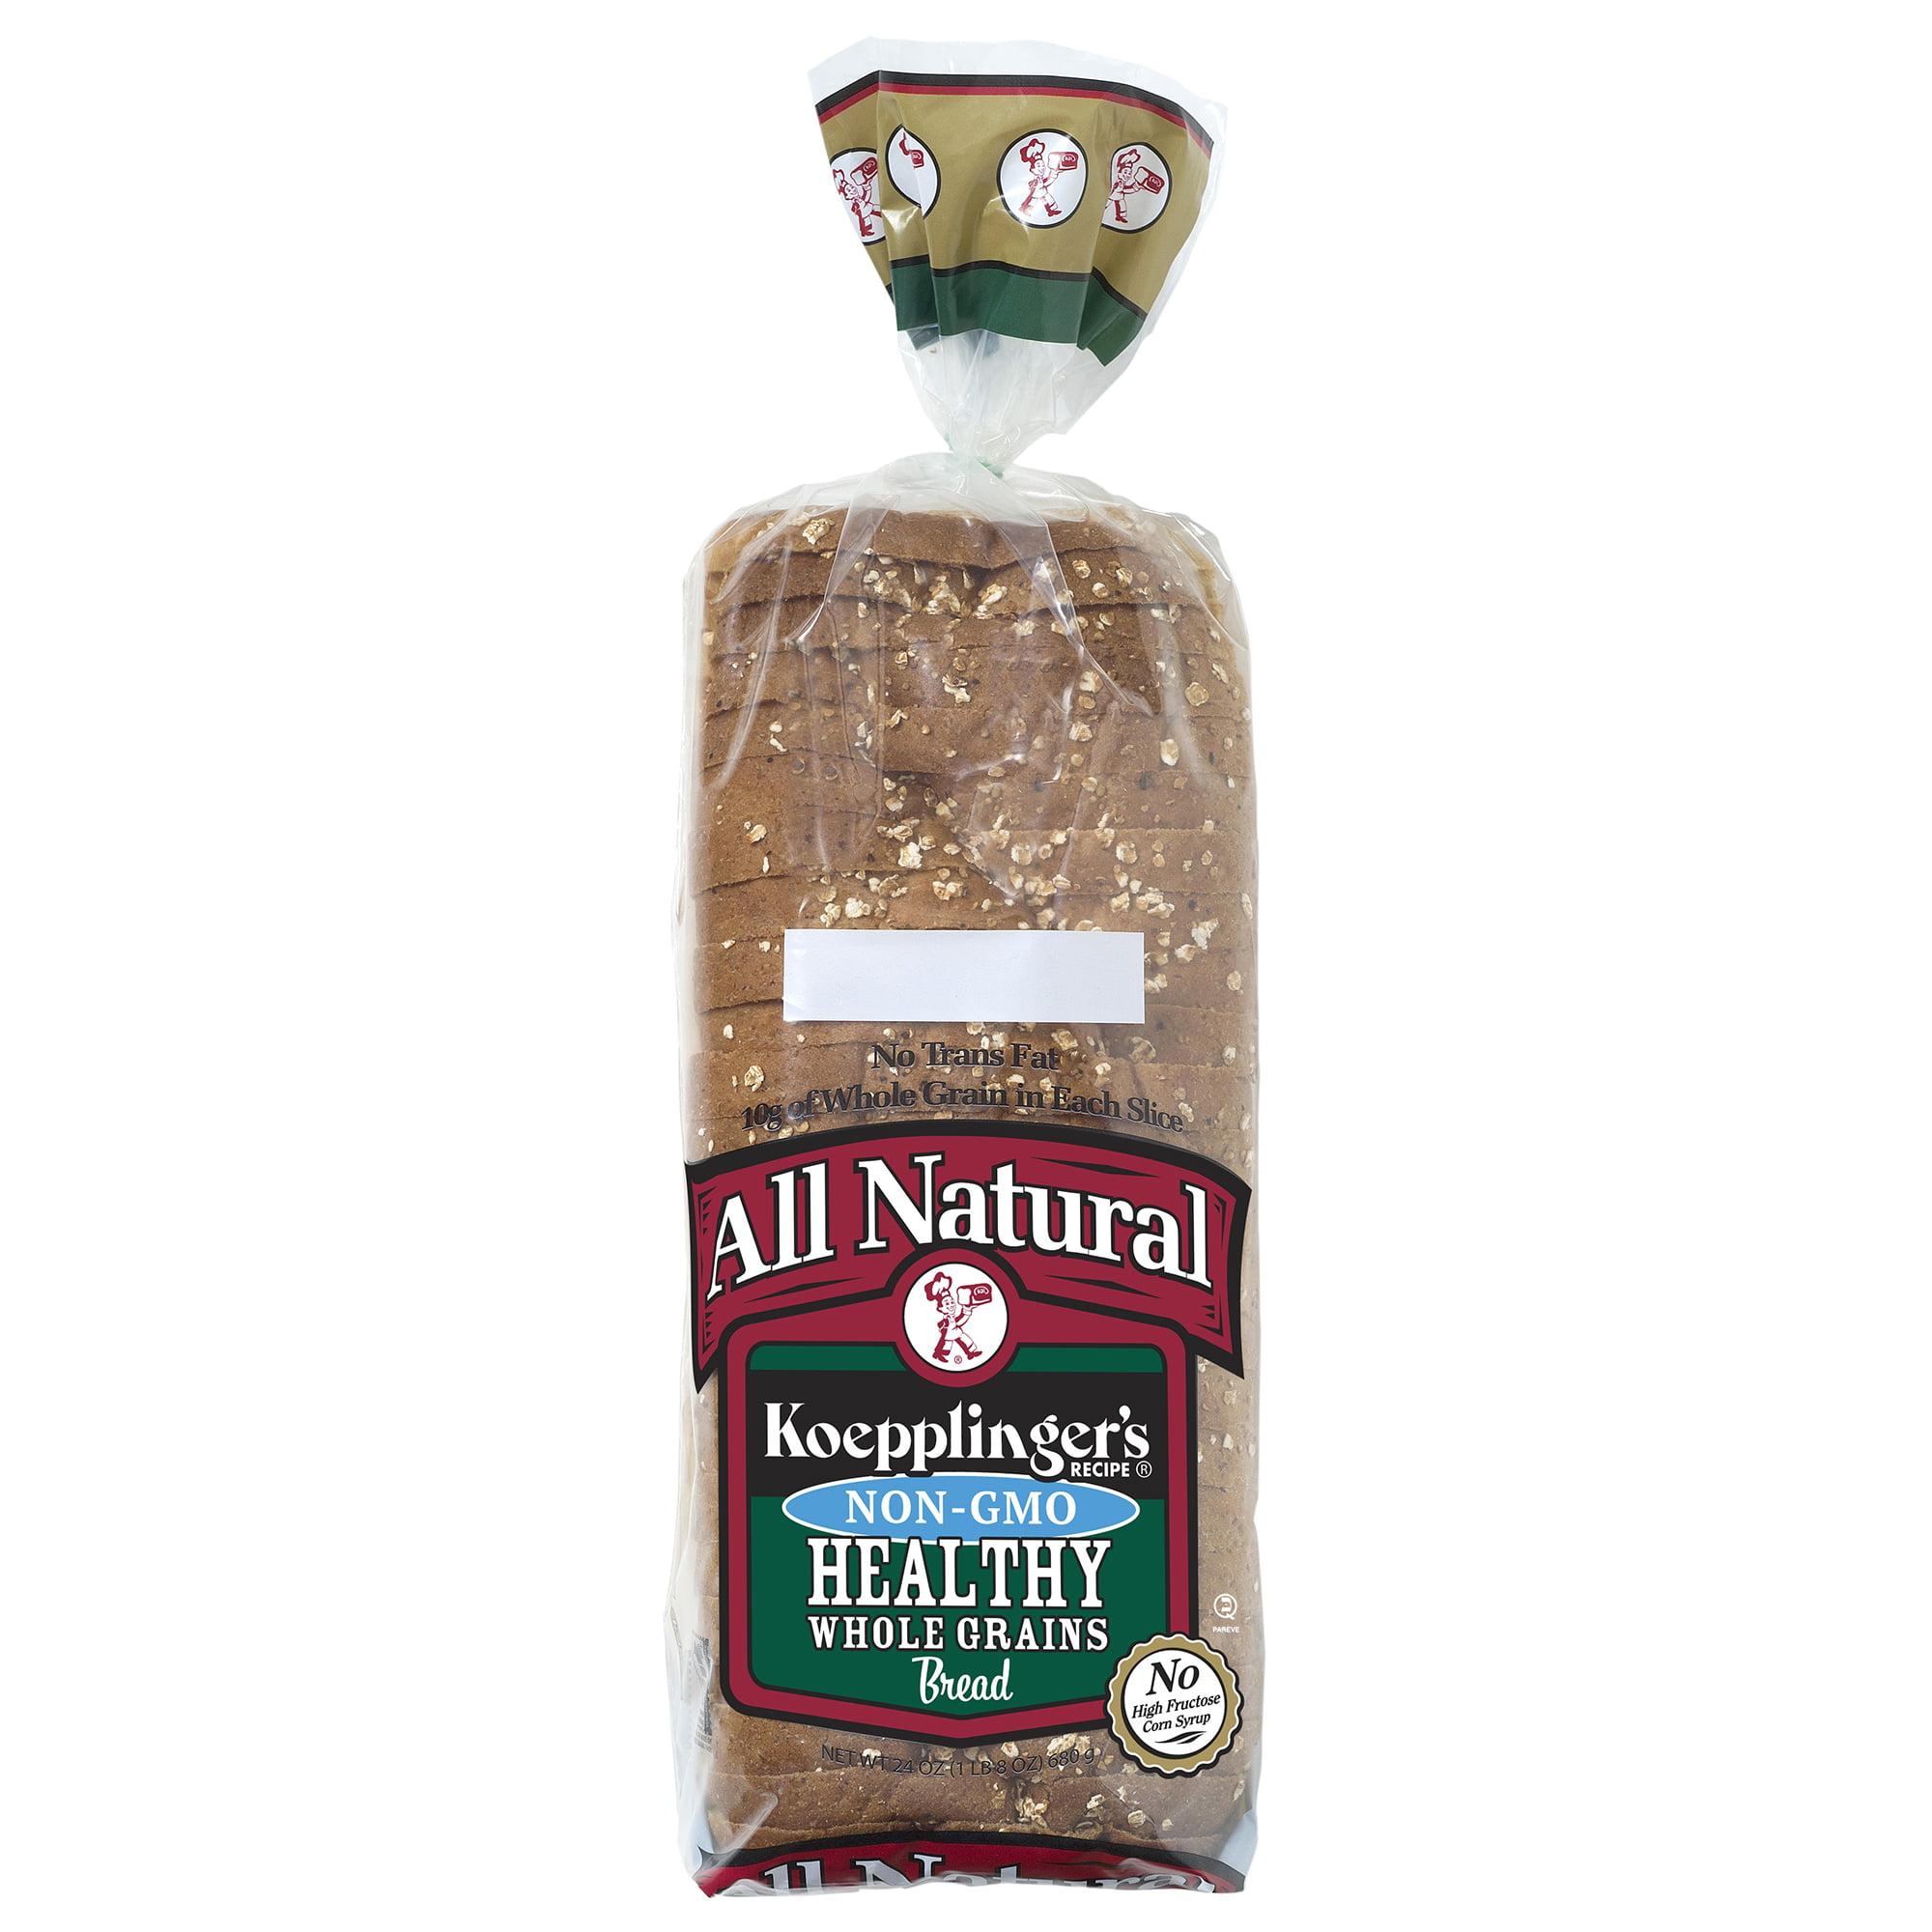 Koepplinger's Healthy Whole Grains Bread, 24 oz.